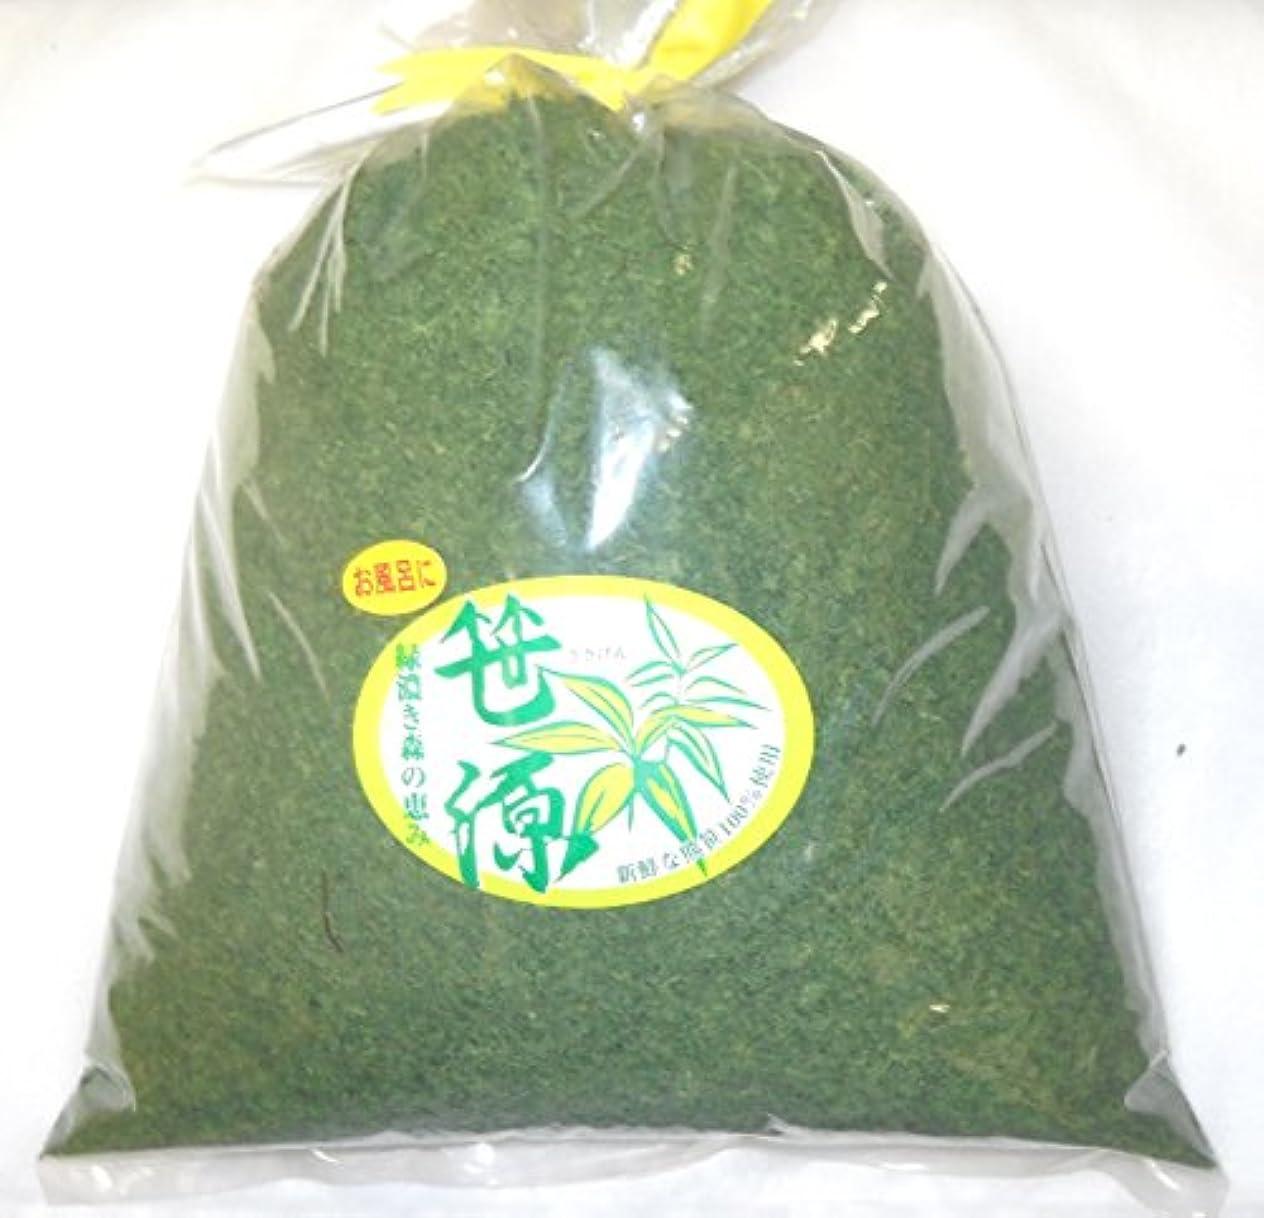 包帯バングカブ【産地直送】長野県産クマ笹 笹源(生)2kg 無添加浴用剤